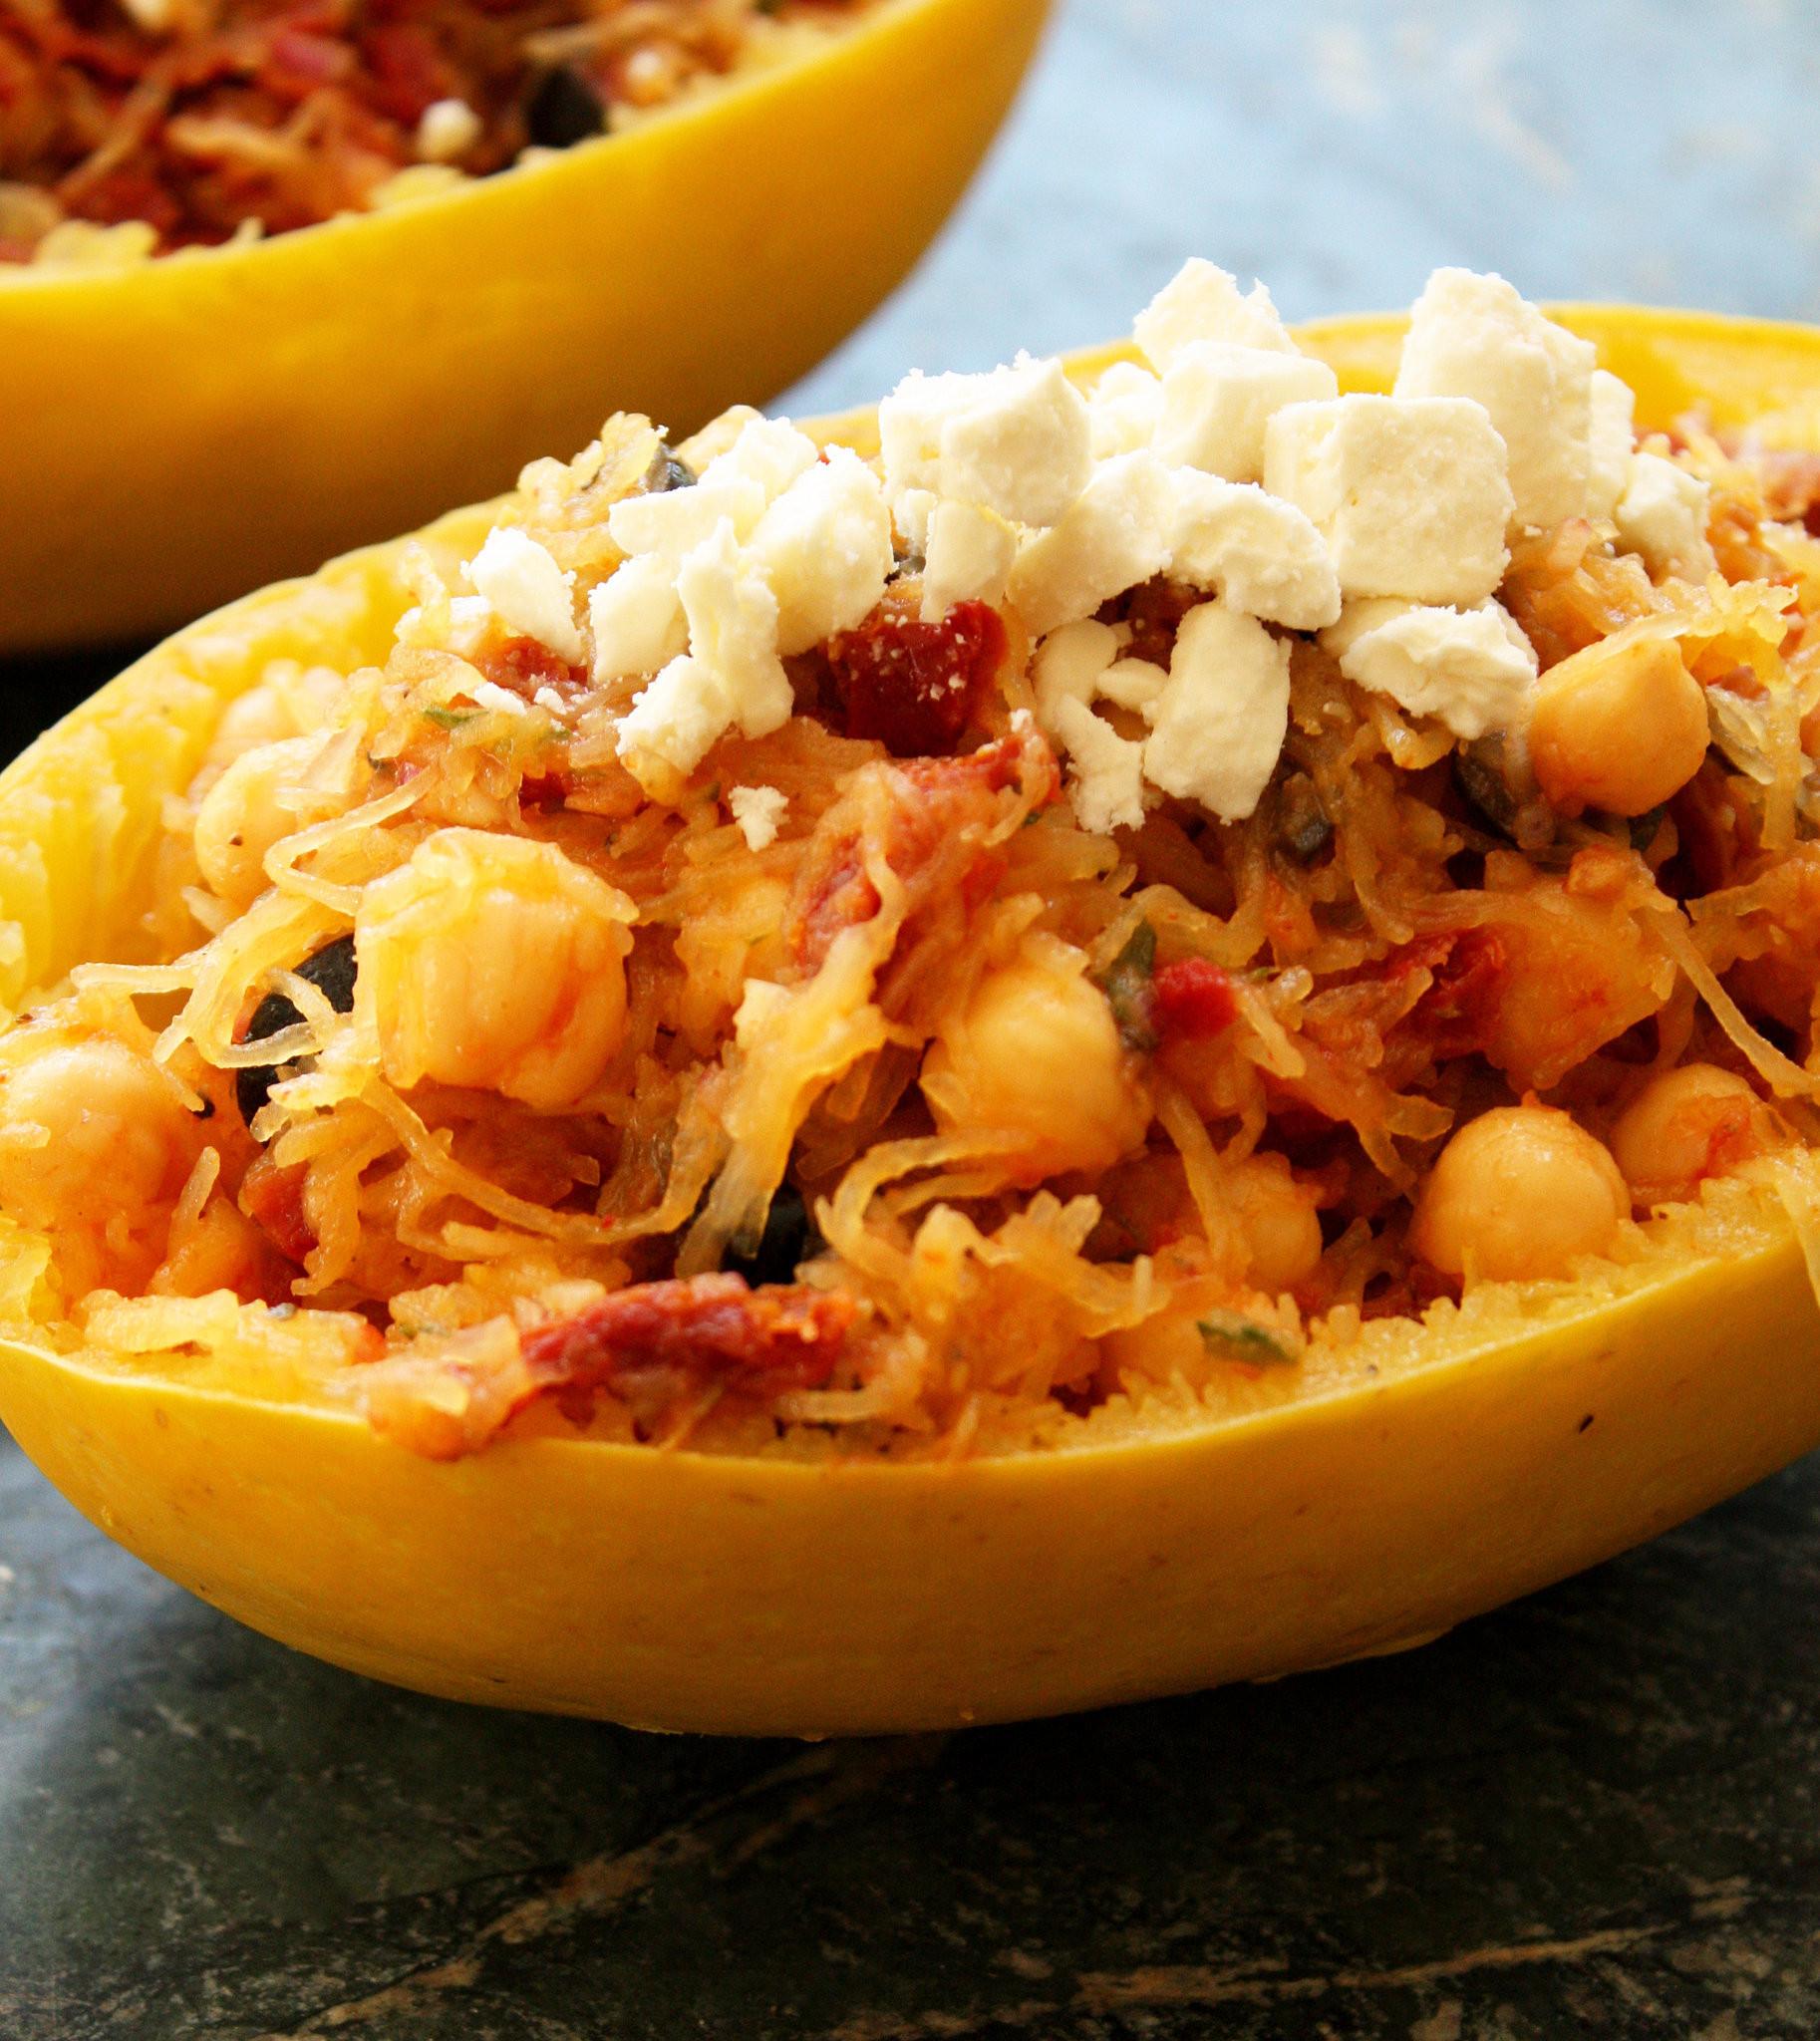 Spaghetti Squash Healthy Recipes  Healthy Spaghetti Squash Meal Recipes